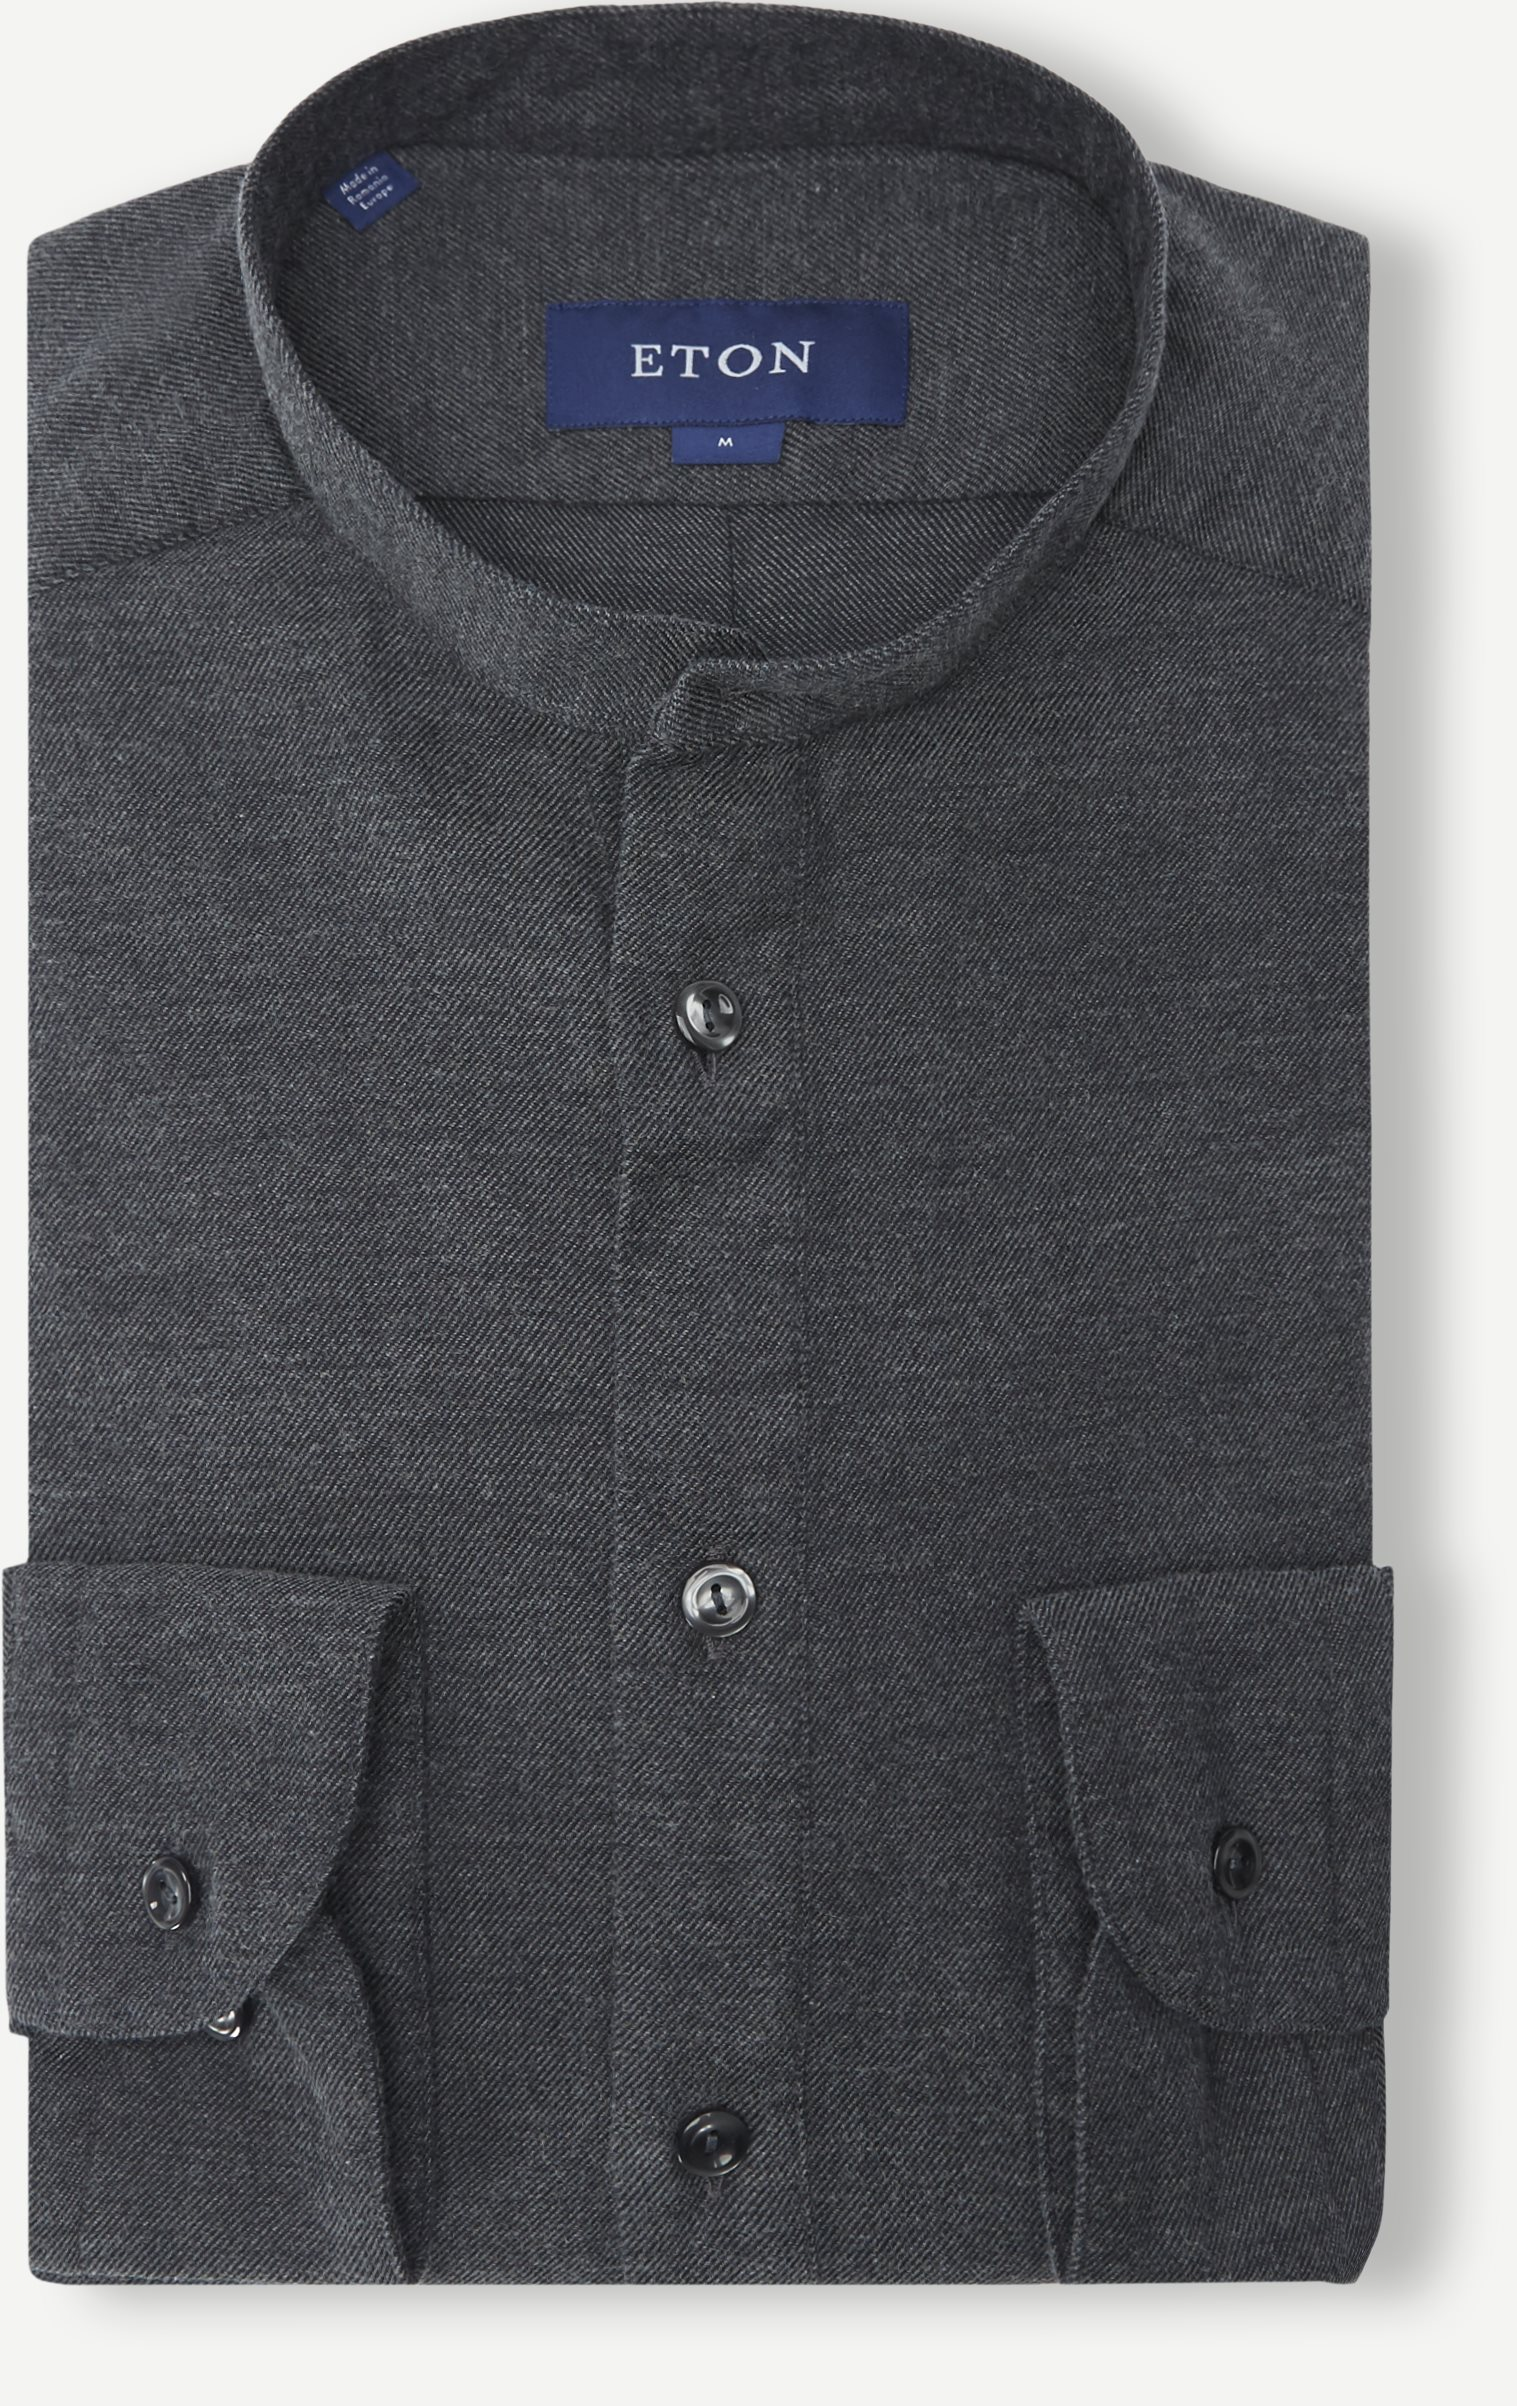 Shirts - Slim fit - Grey